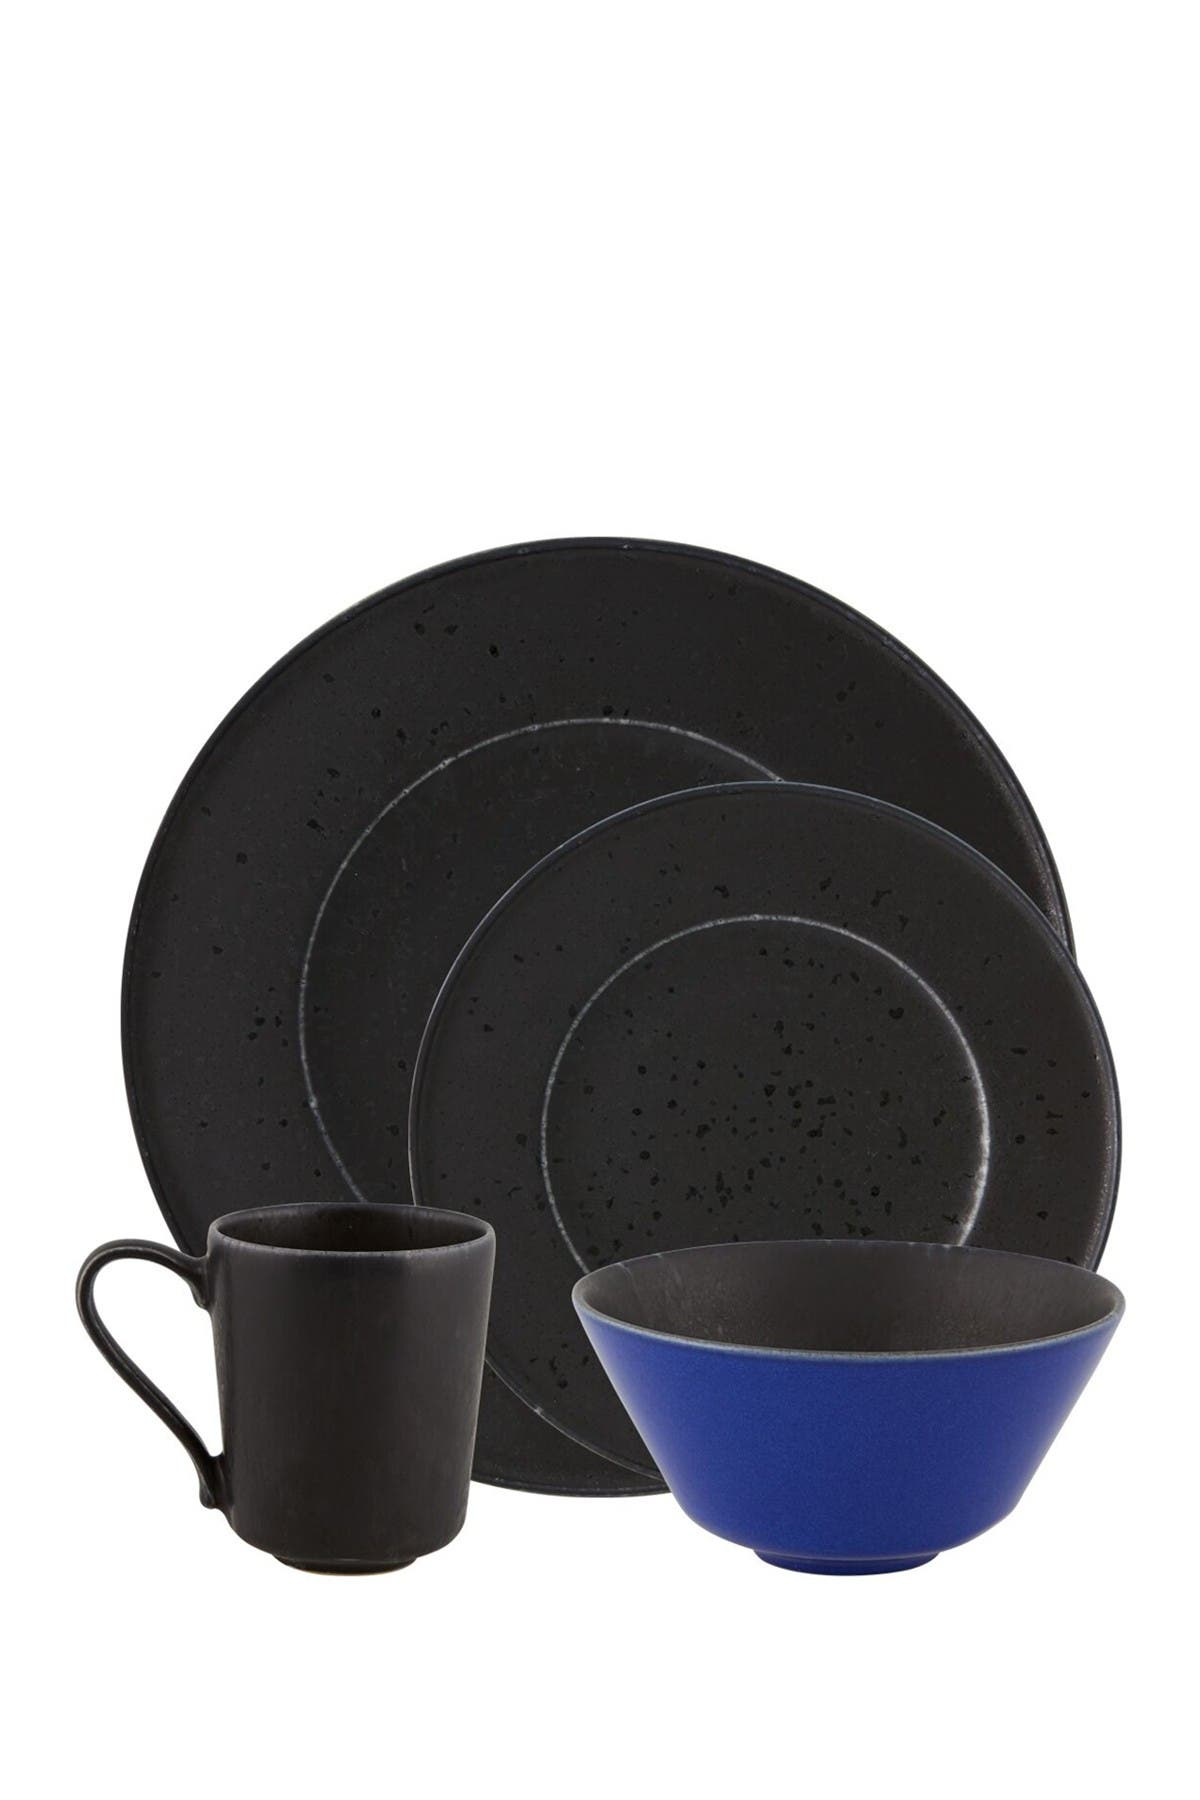 Image of Casa Alegre Noir Dinnerware 4-Piece Place Setting - Black